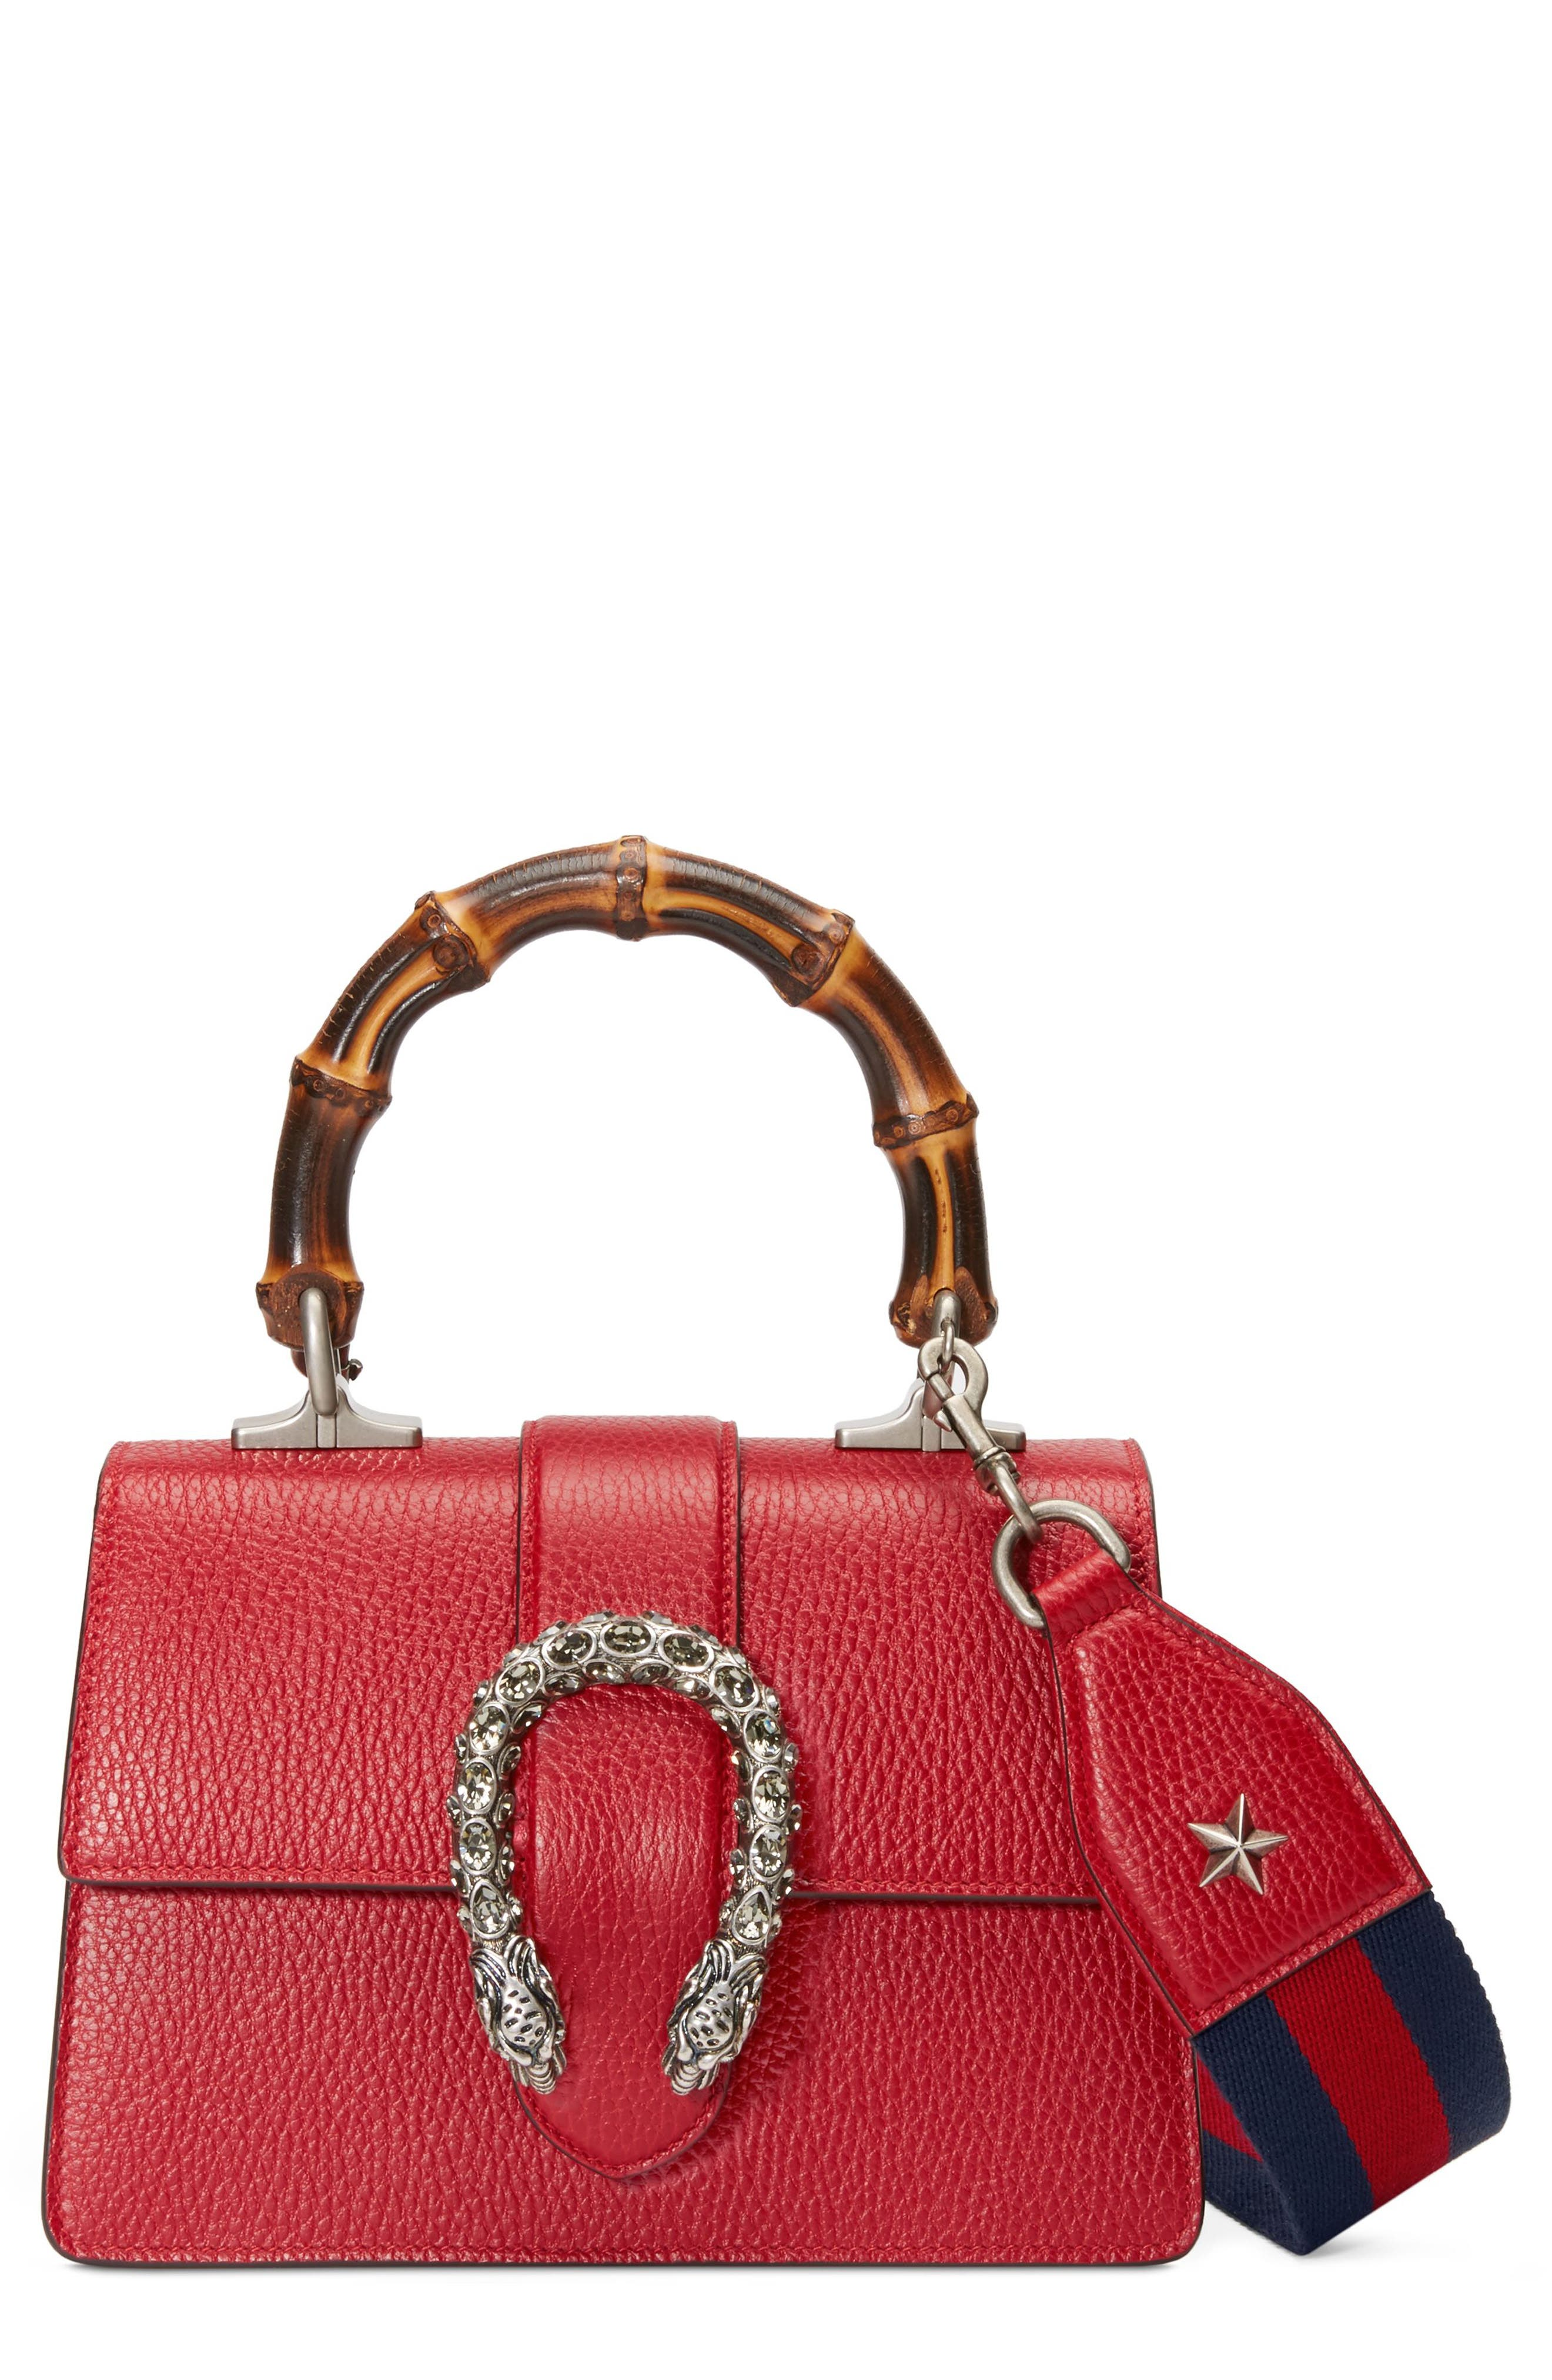 Mini Dionysus Leather Top Handle Satchel,                             Main thumbnail 1, color,                             Red/ Blue/ Black Diamond